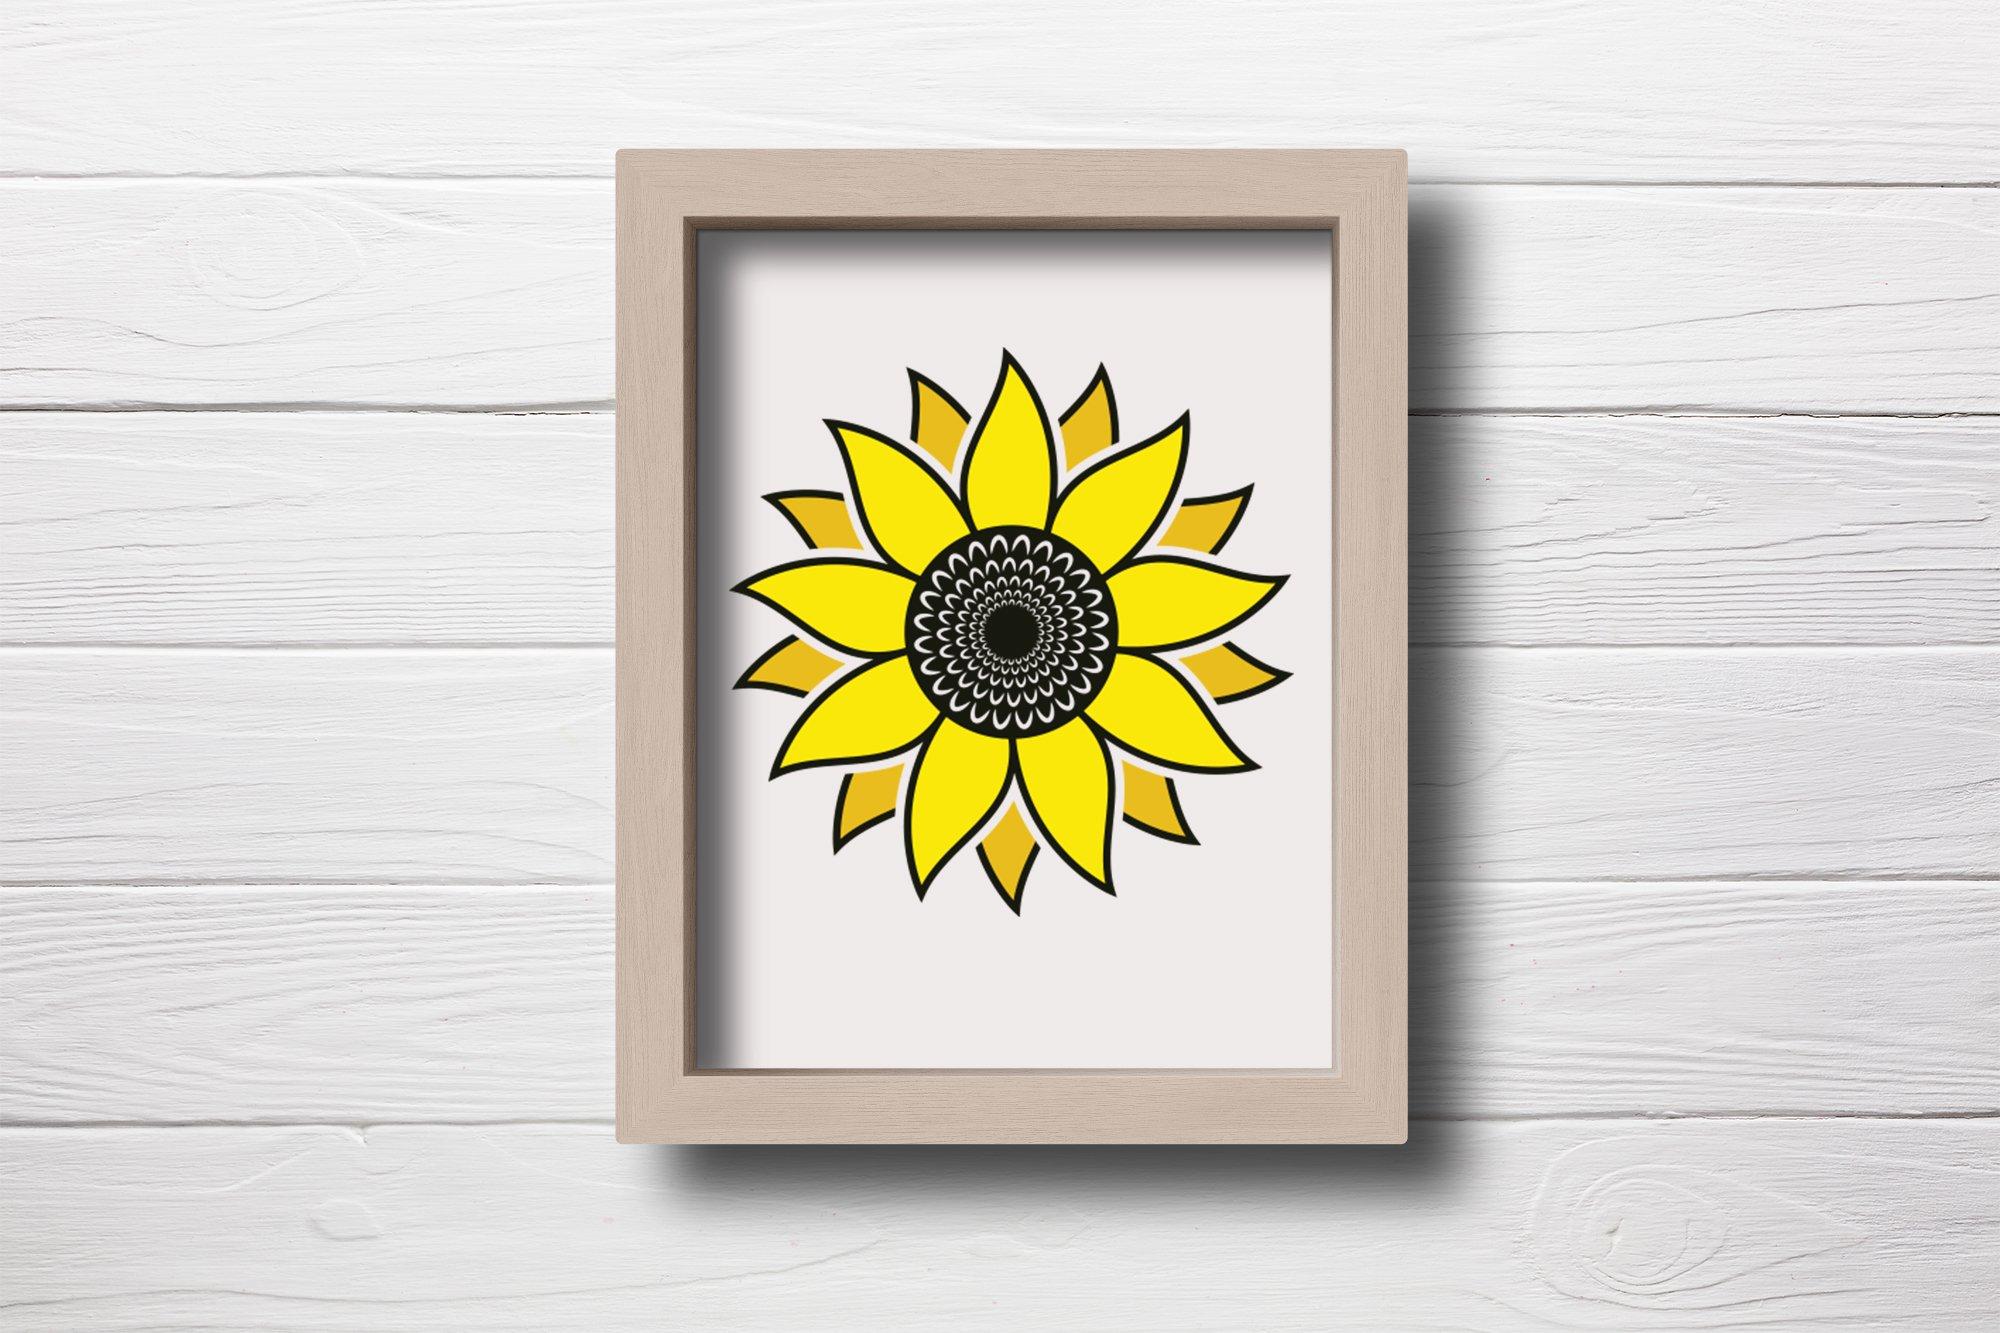 Sunflower SVG, Sunflower Clipart, Sunflower Monogram SVG example image 4